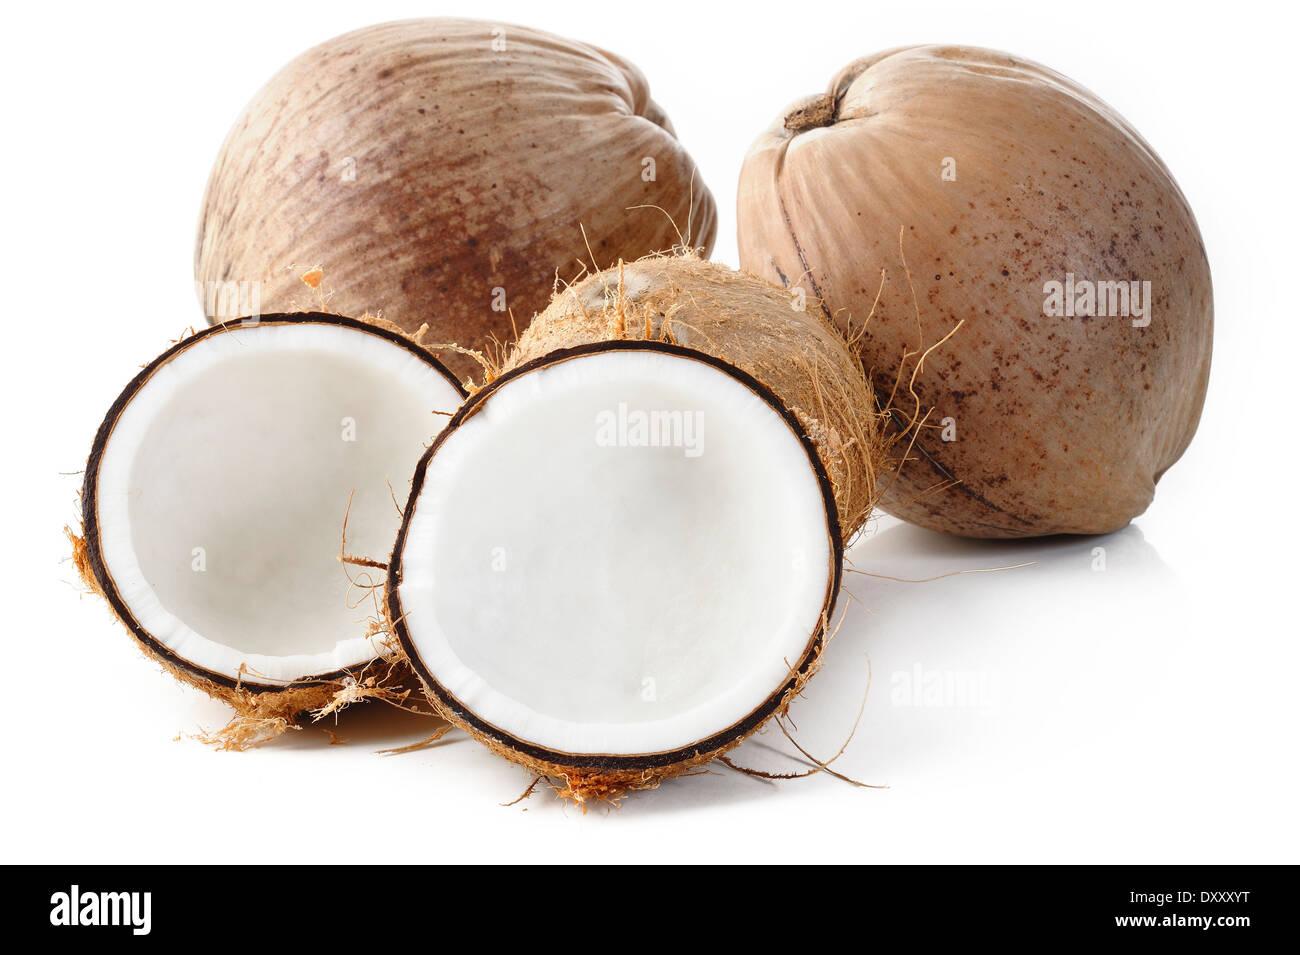 coconut on white background - Stock Image